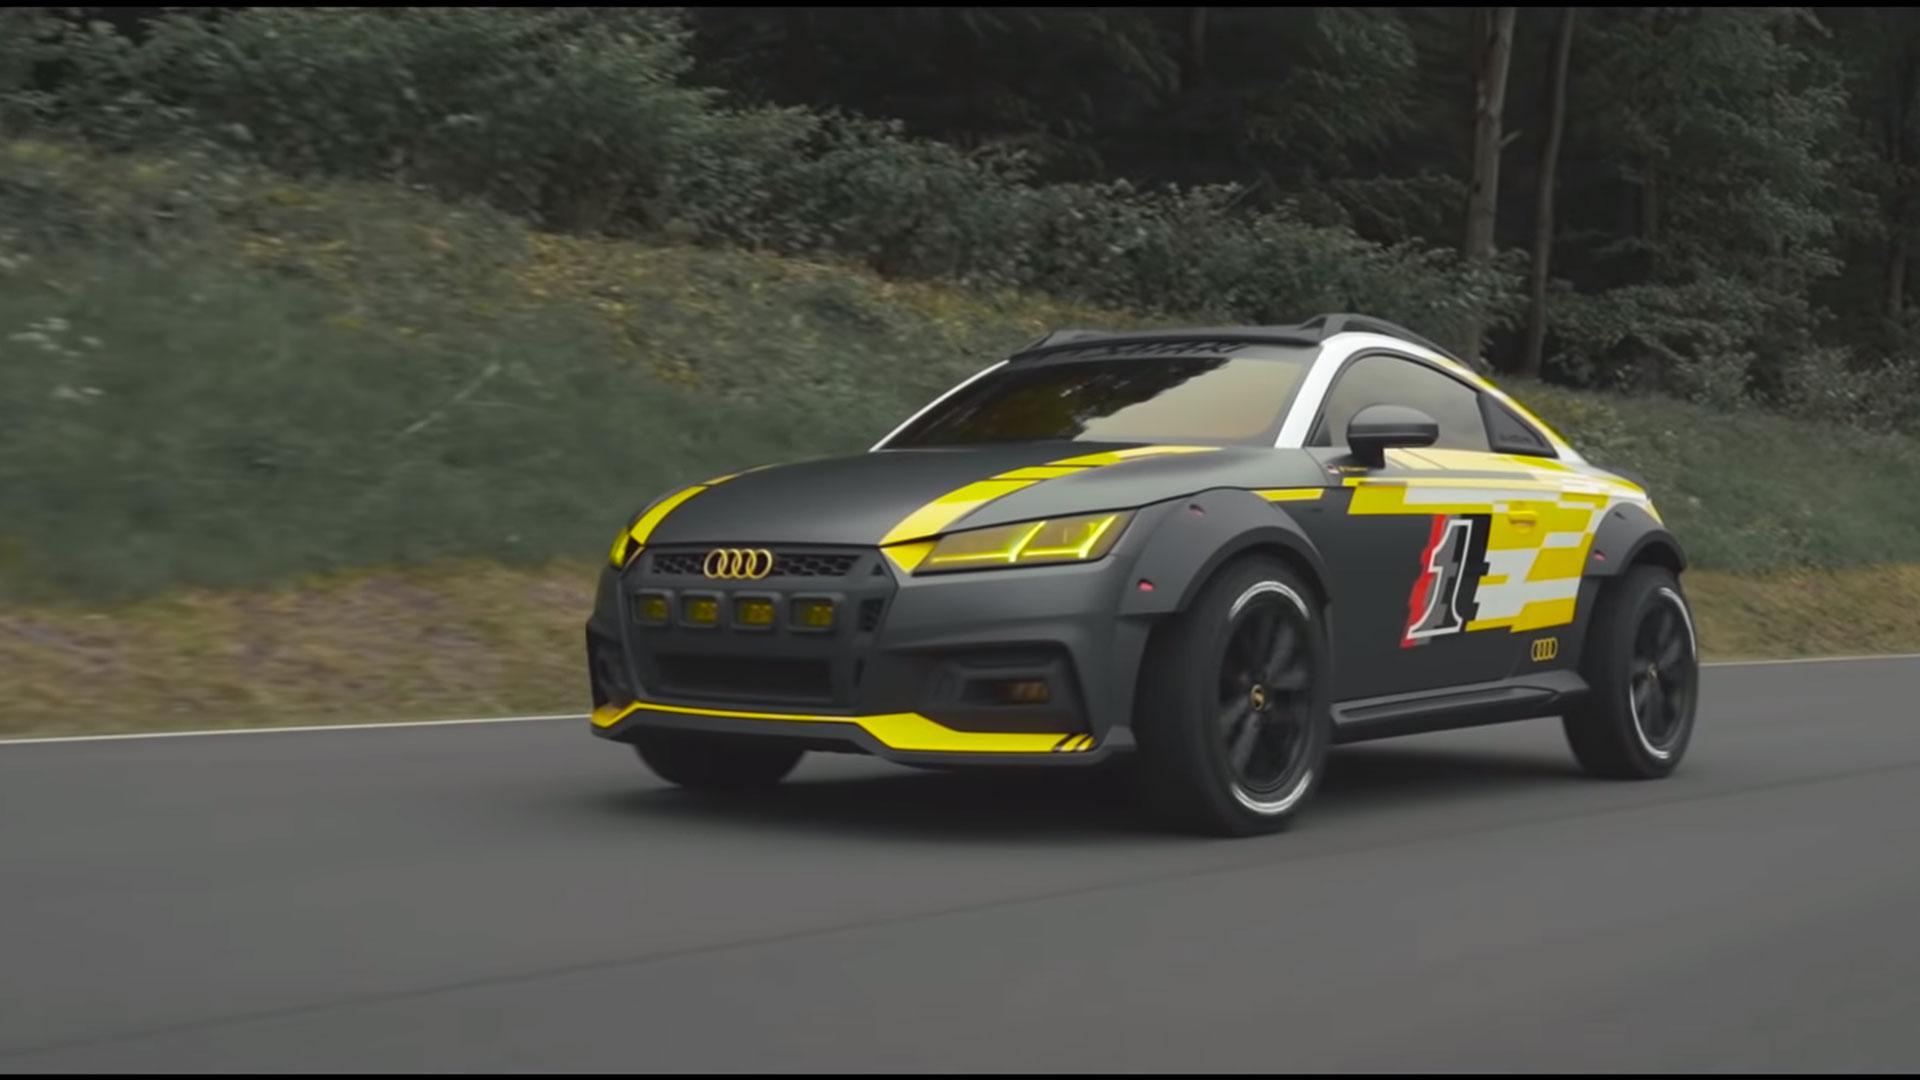 Audi TT_safari